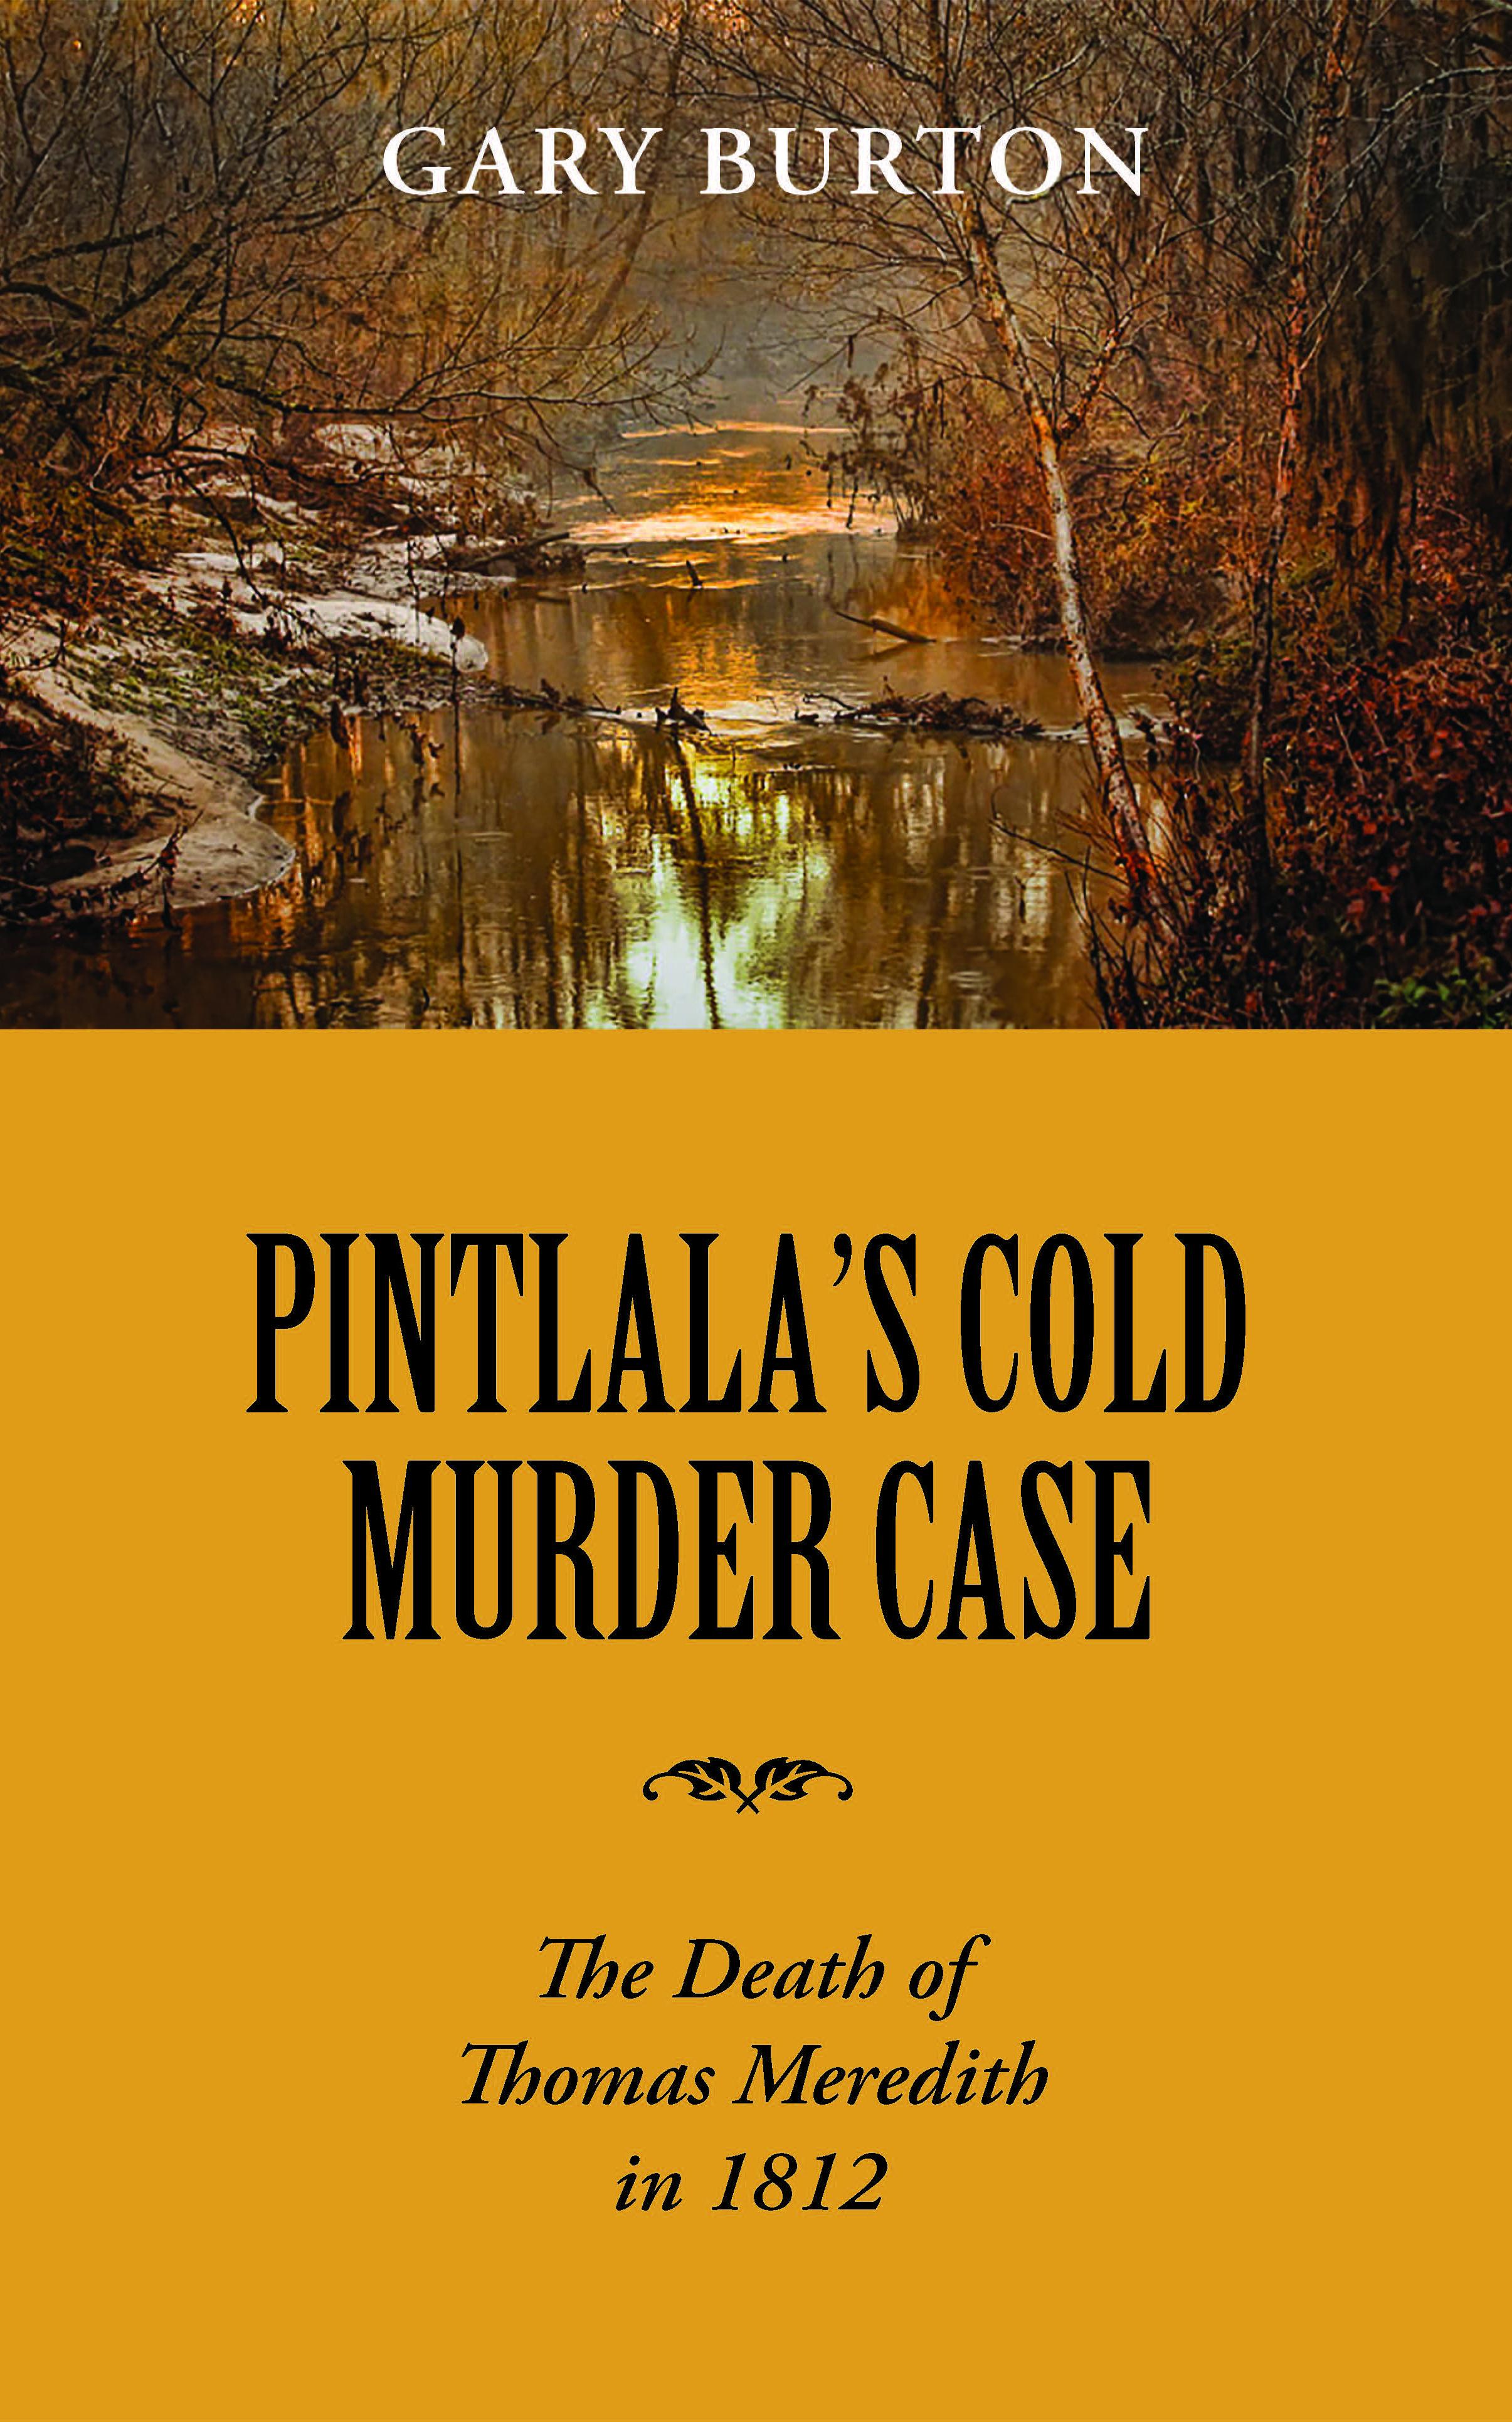 Pintlala's Cold Murder Case